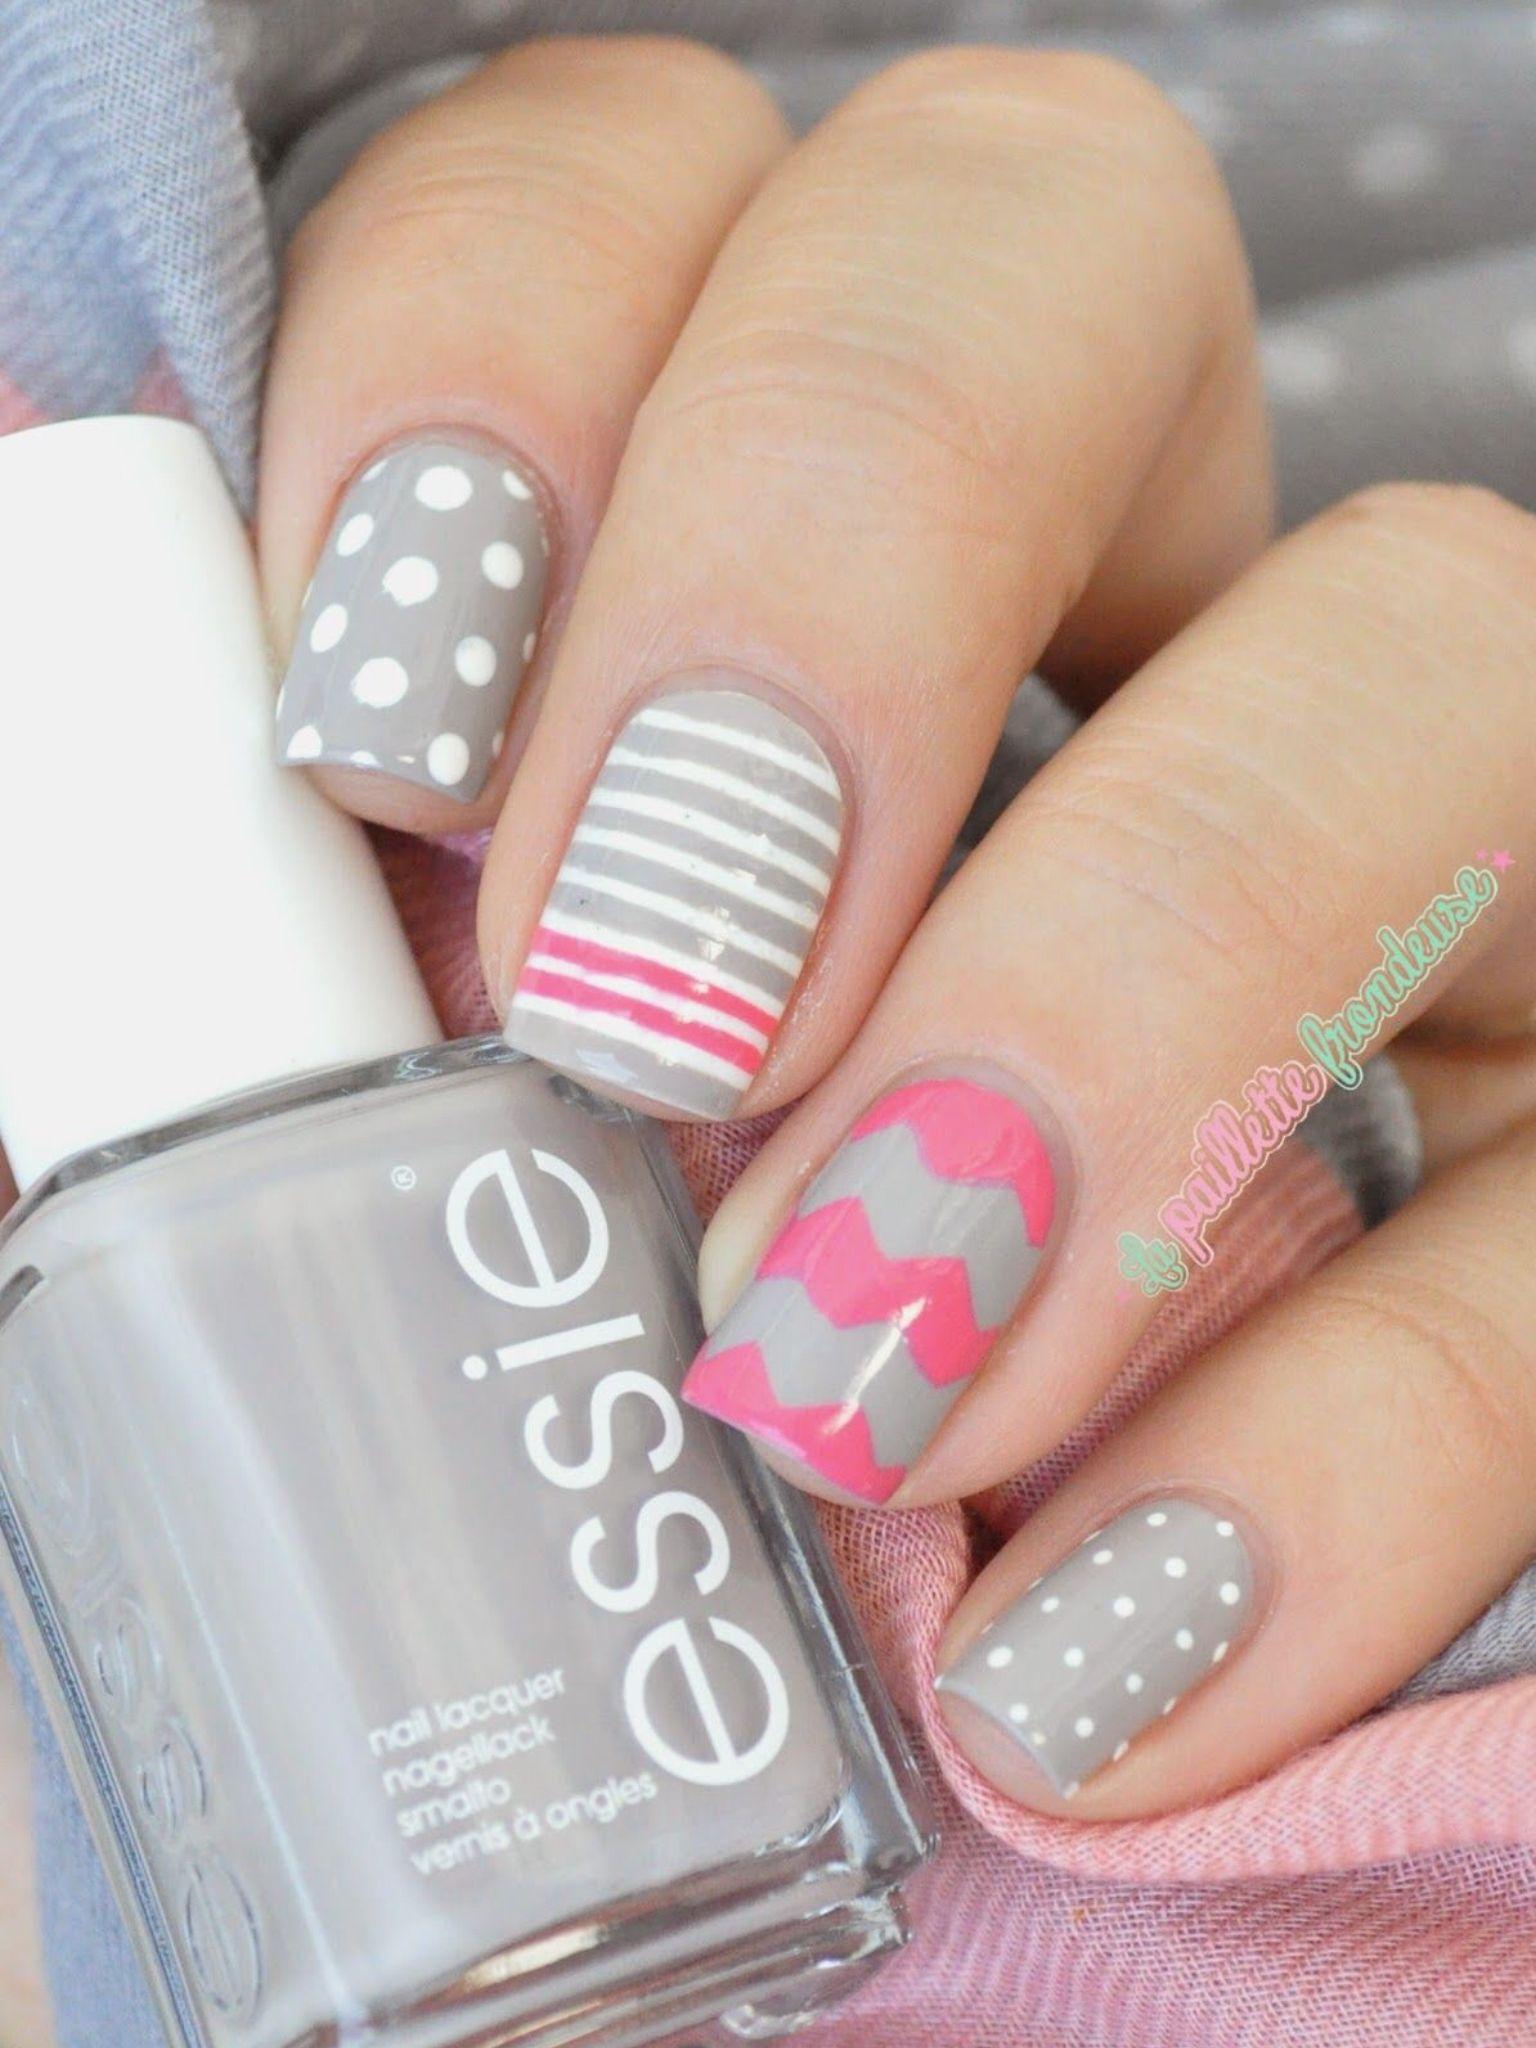 Pin by laĸen мae veyon👸🏼 on Nails! | Pinterest | Manicure, Pretty ...